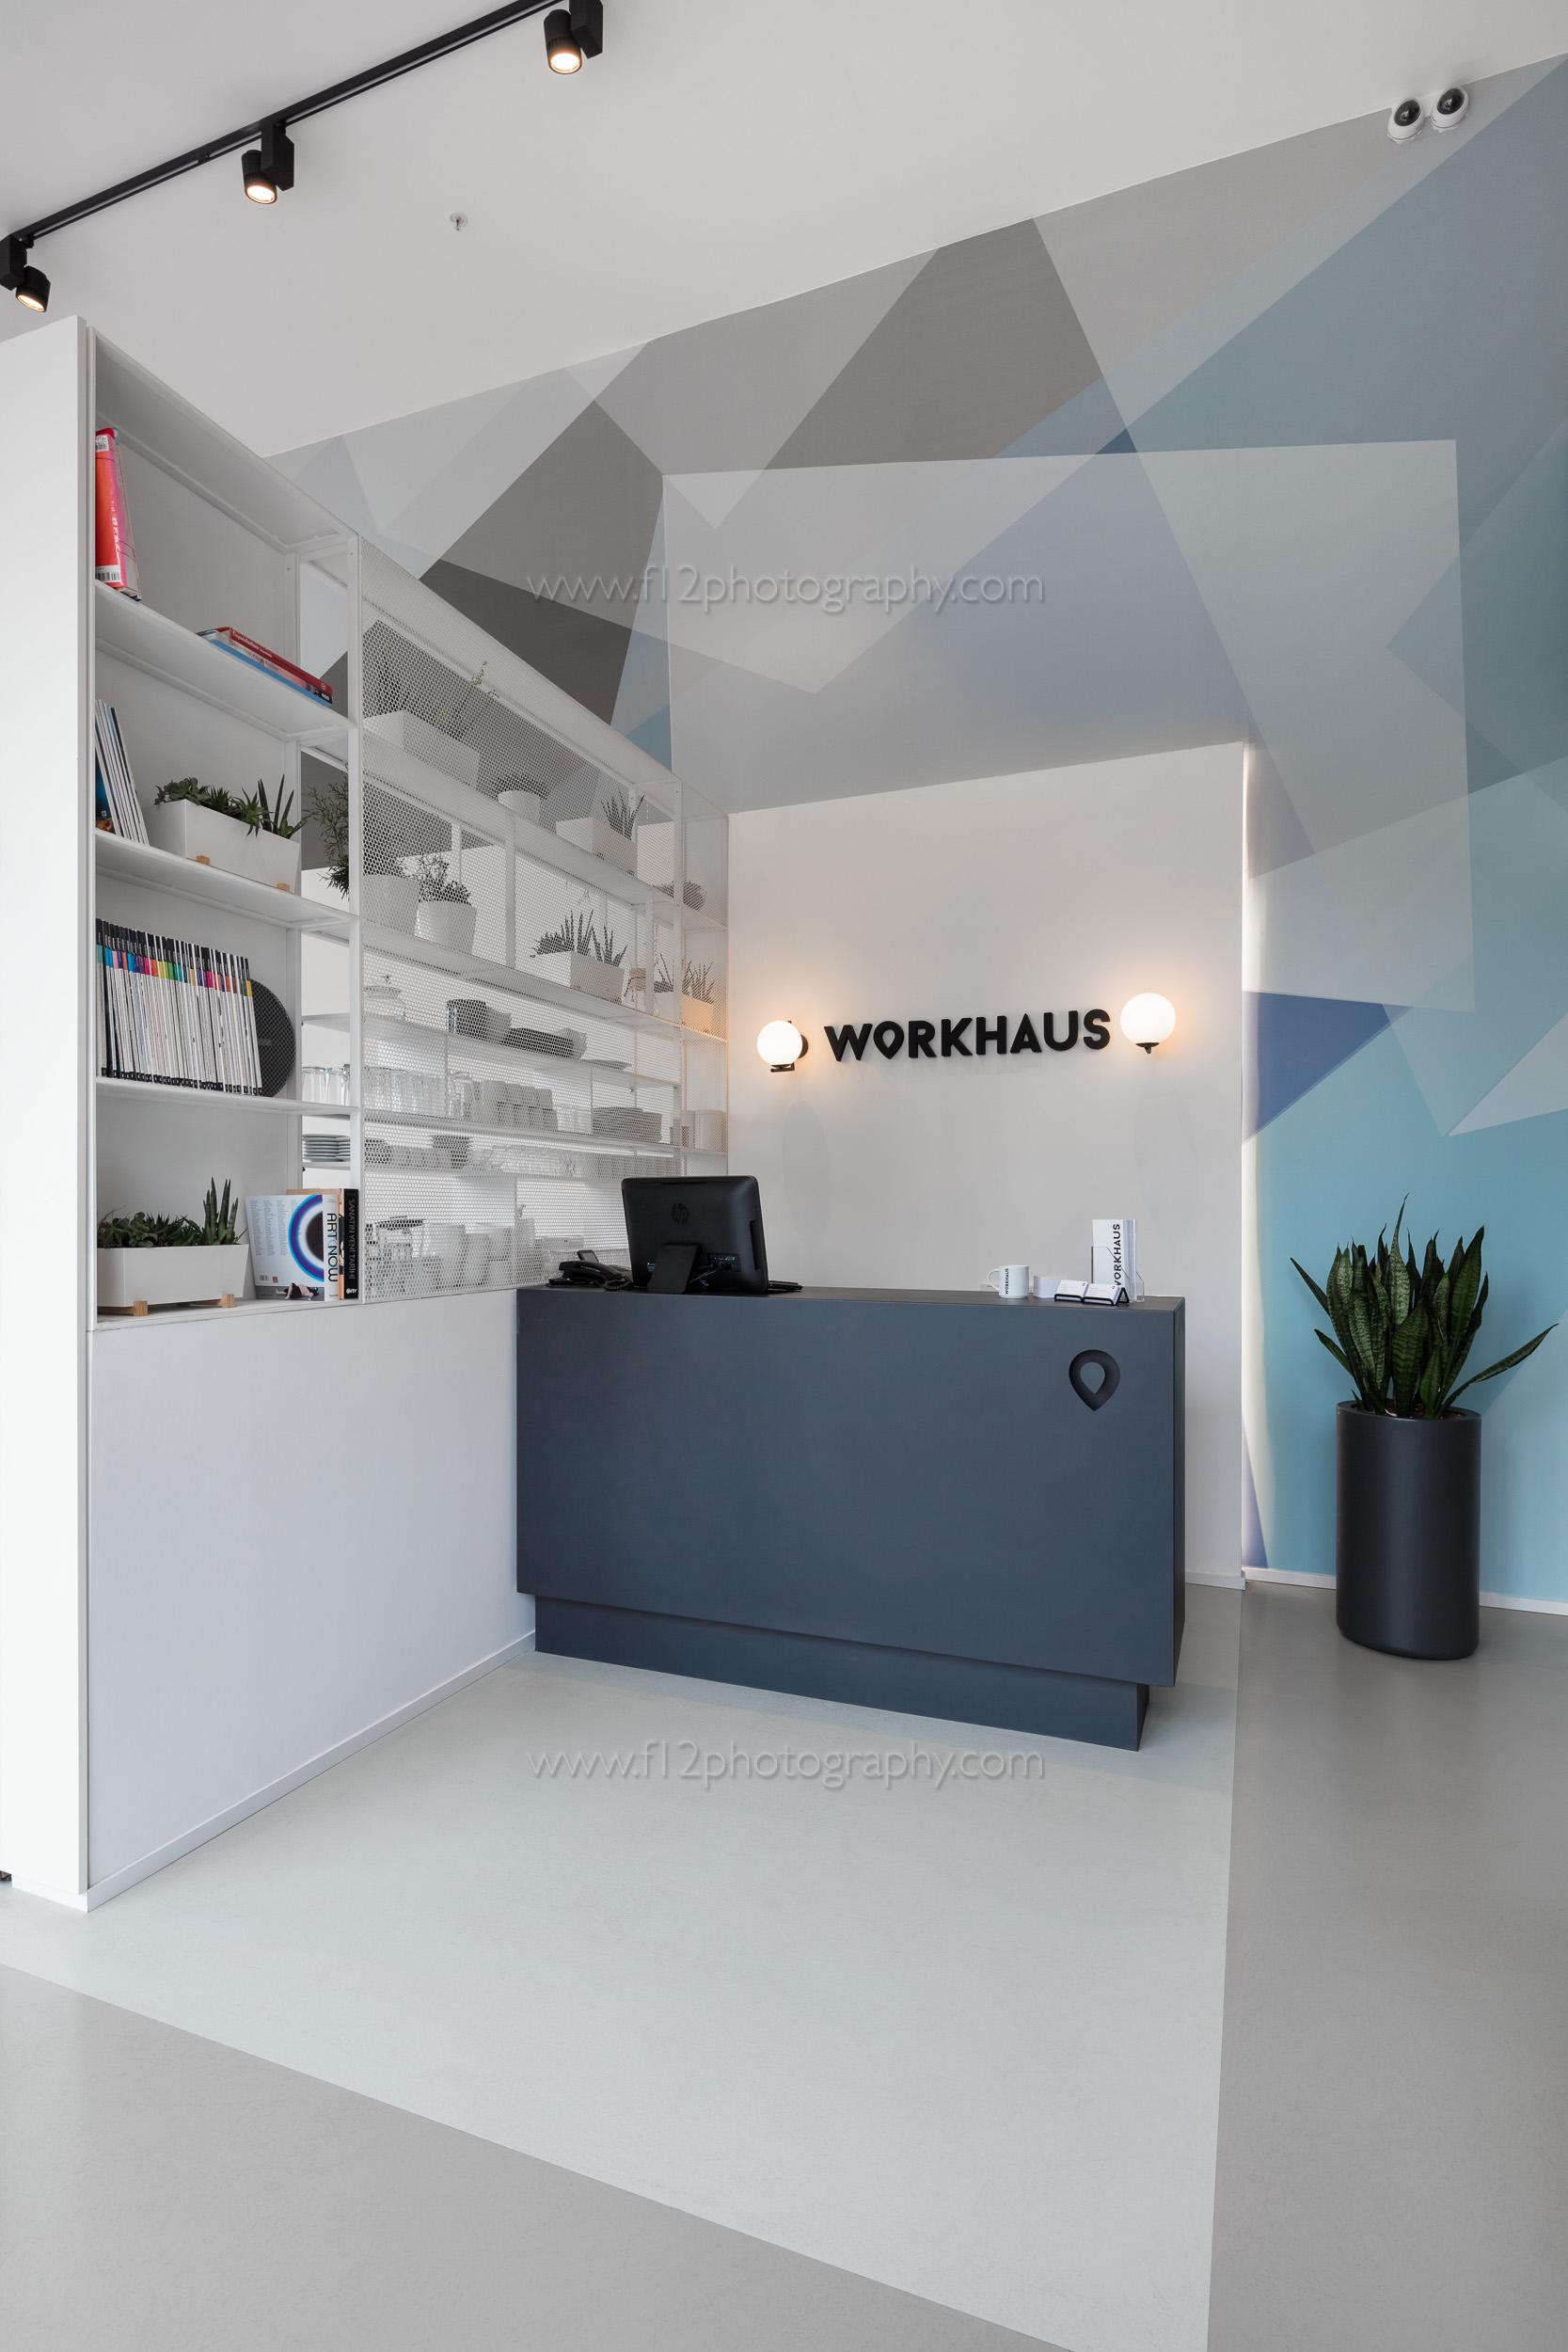 f12-Workhaus-03.jpg